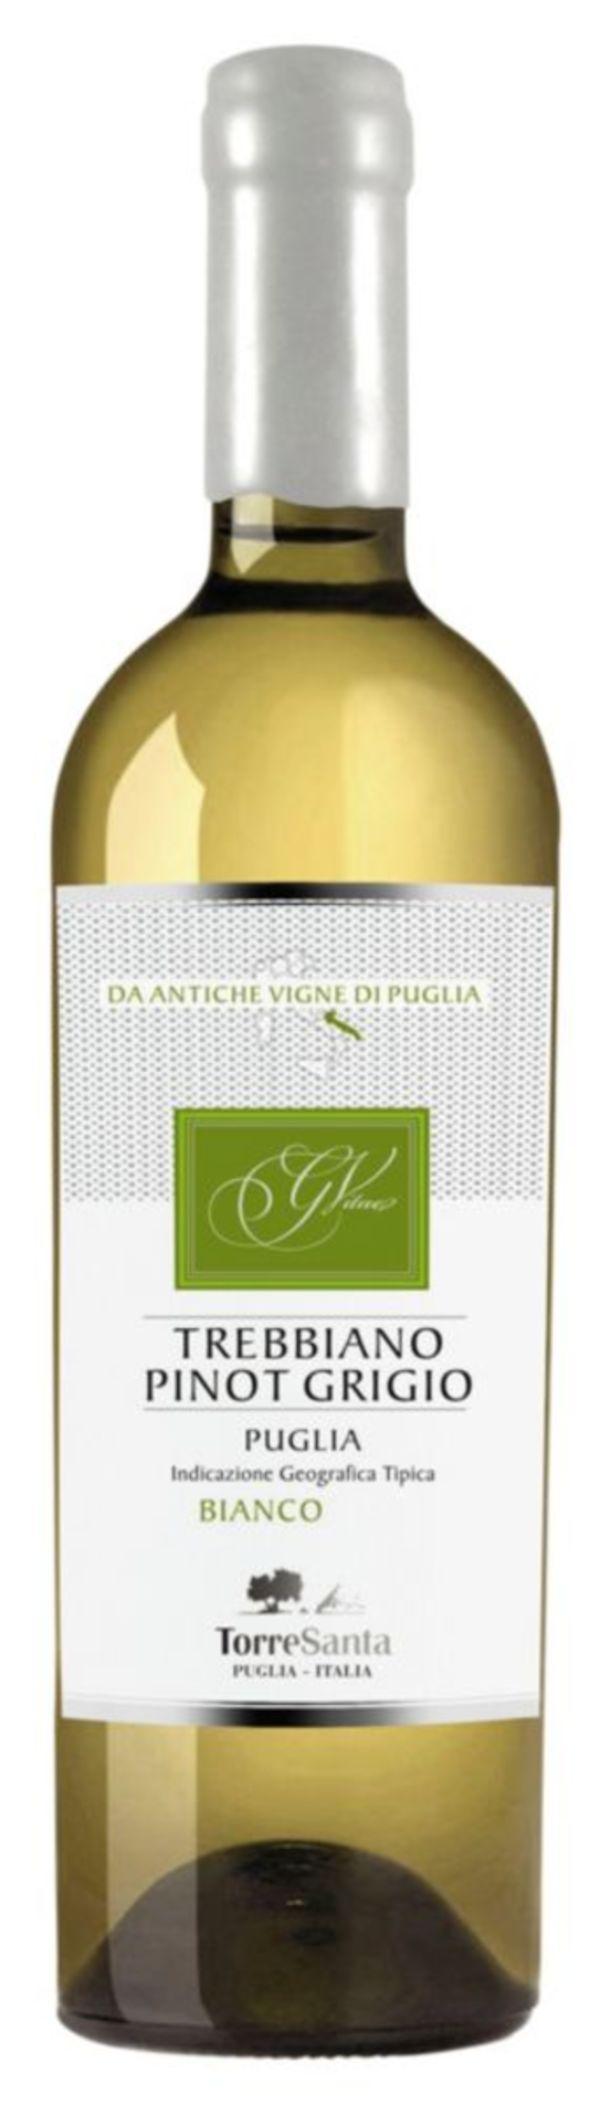 Torre Santa Trebbiano Pinot Grigio IGT